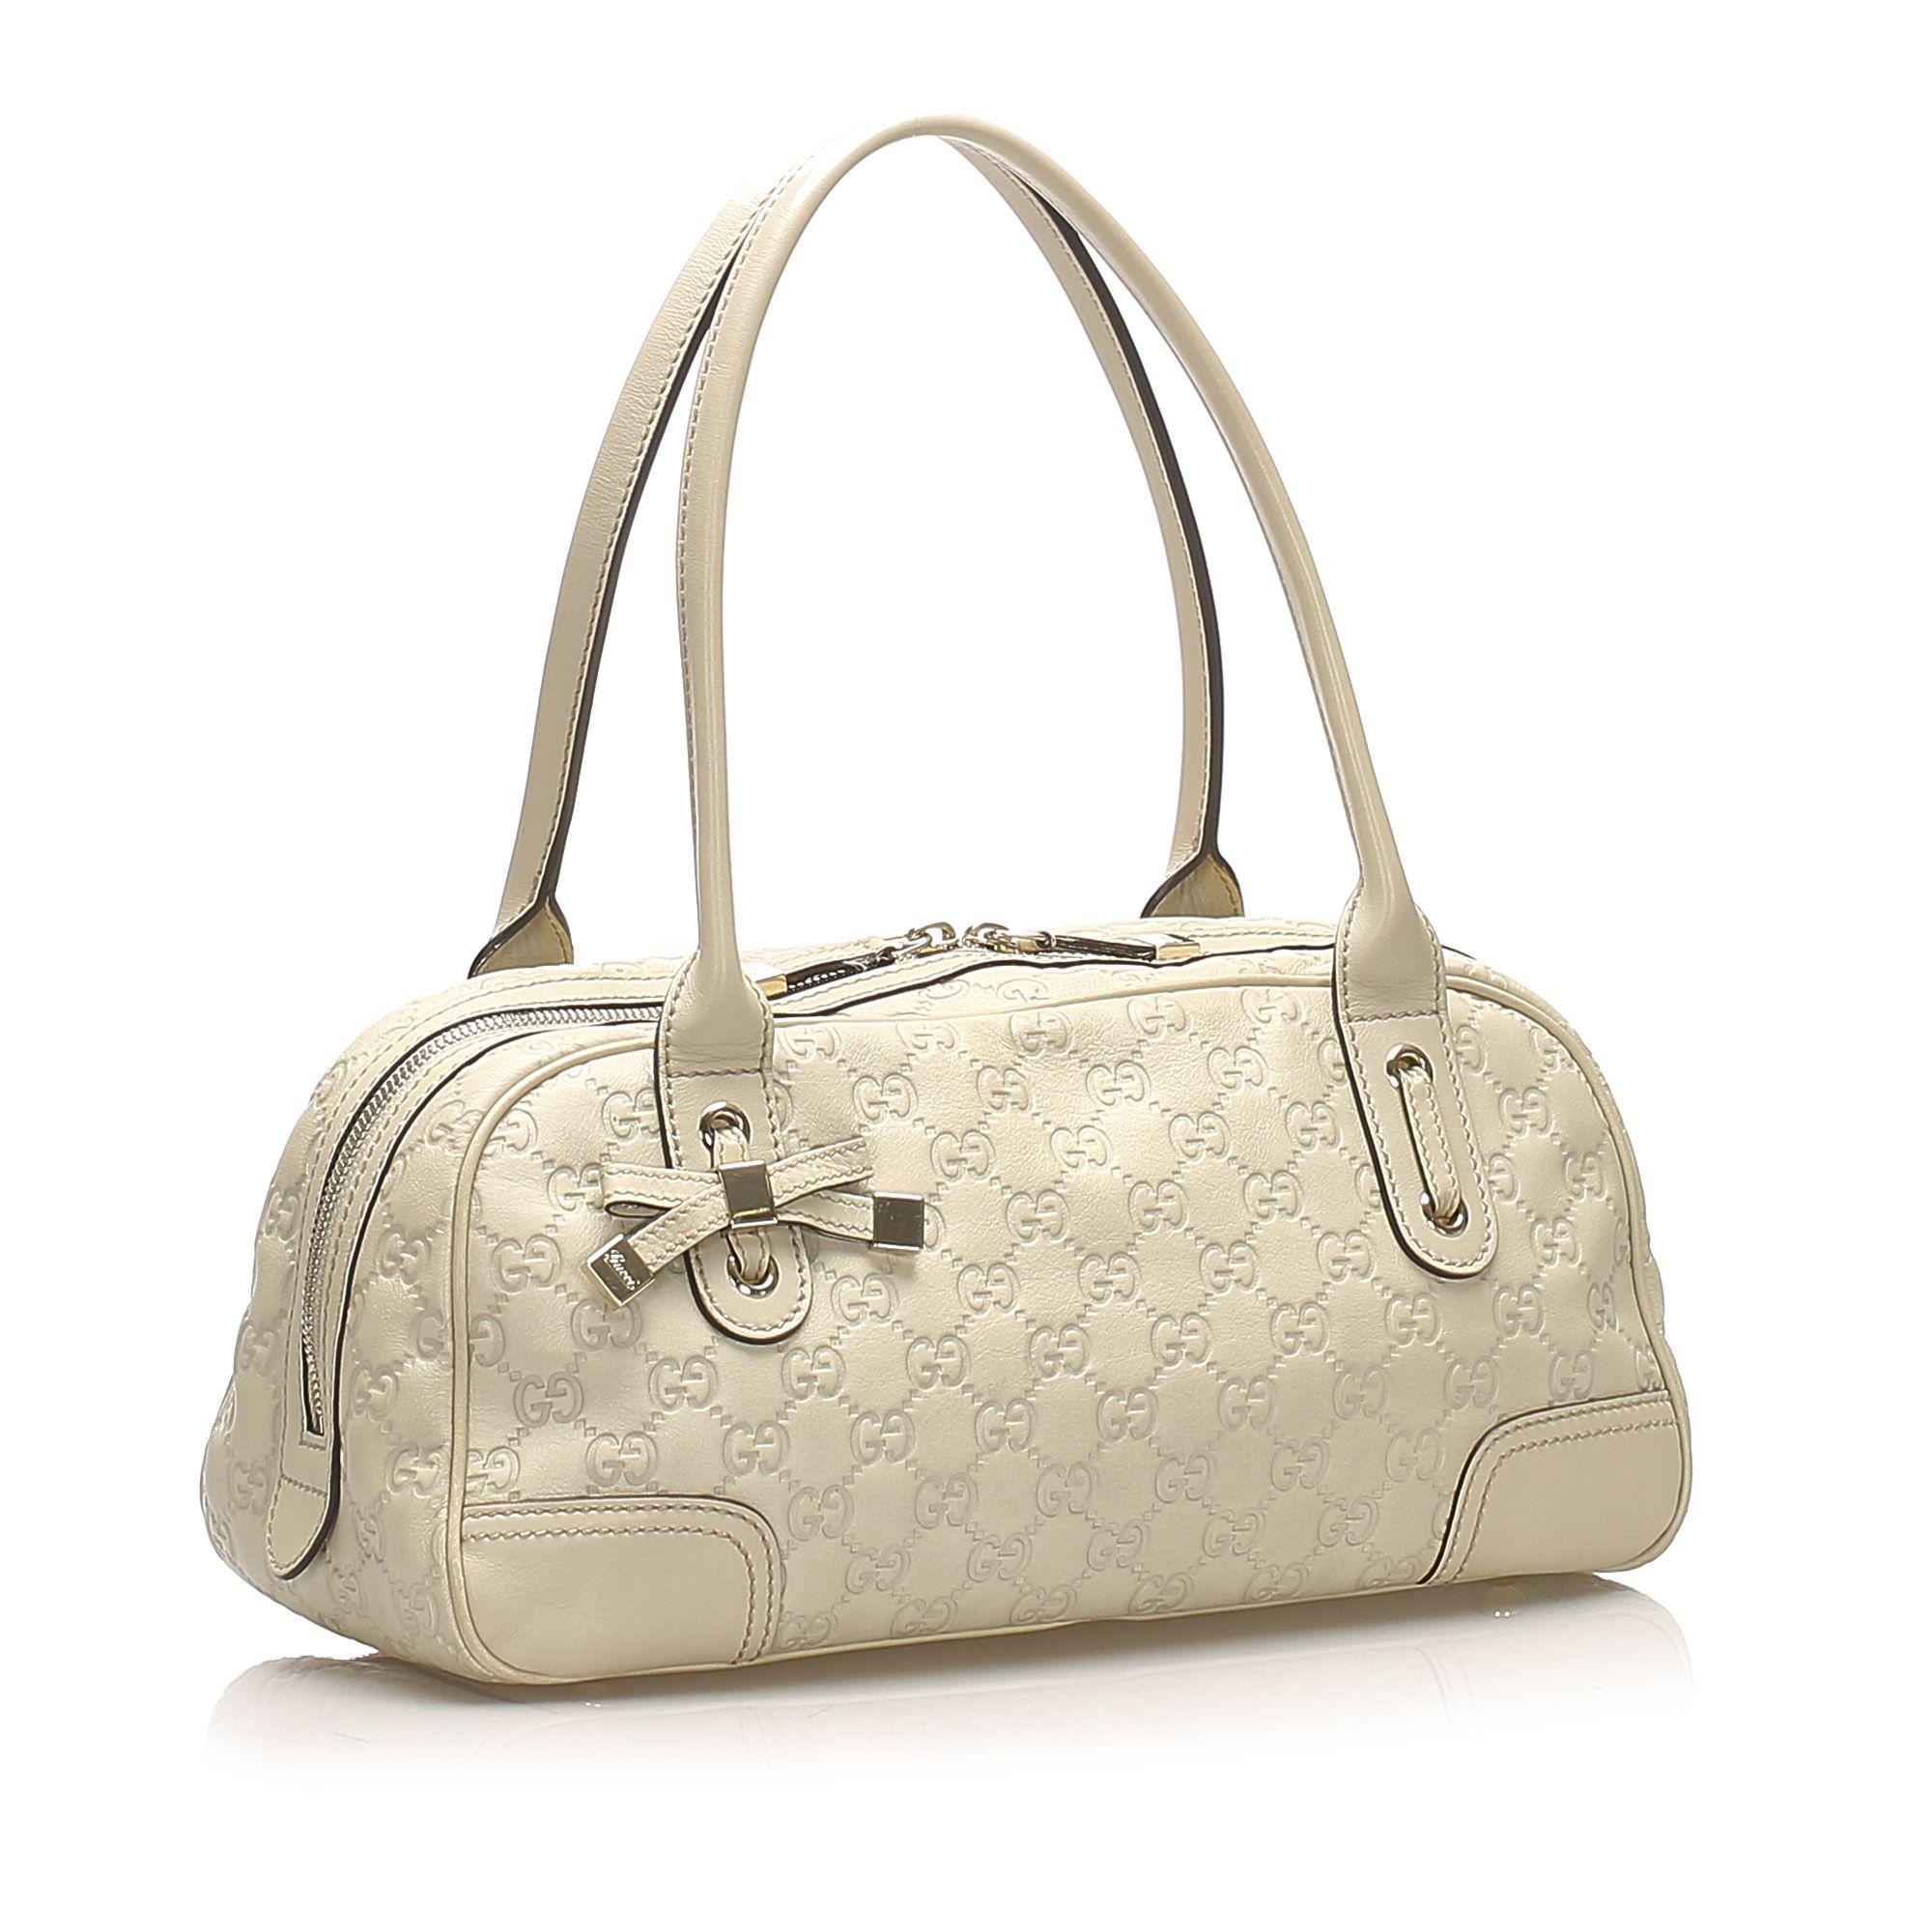 Vintage Gucci Guccissima Princy Shoulder Bag White